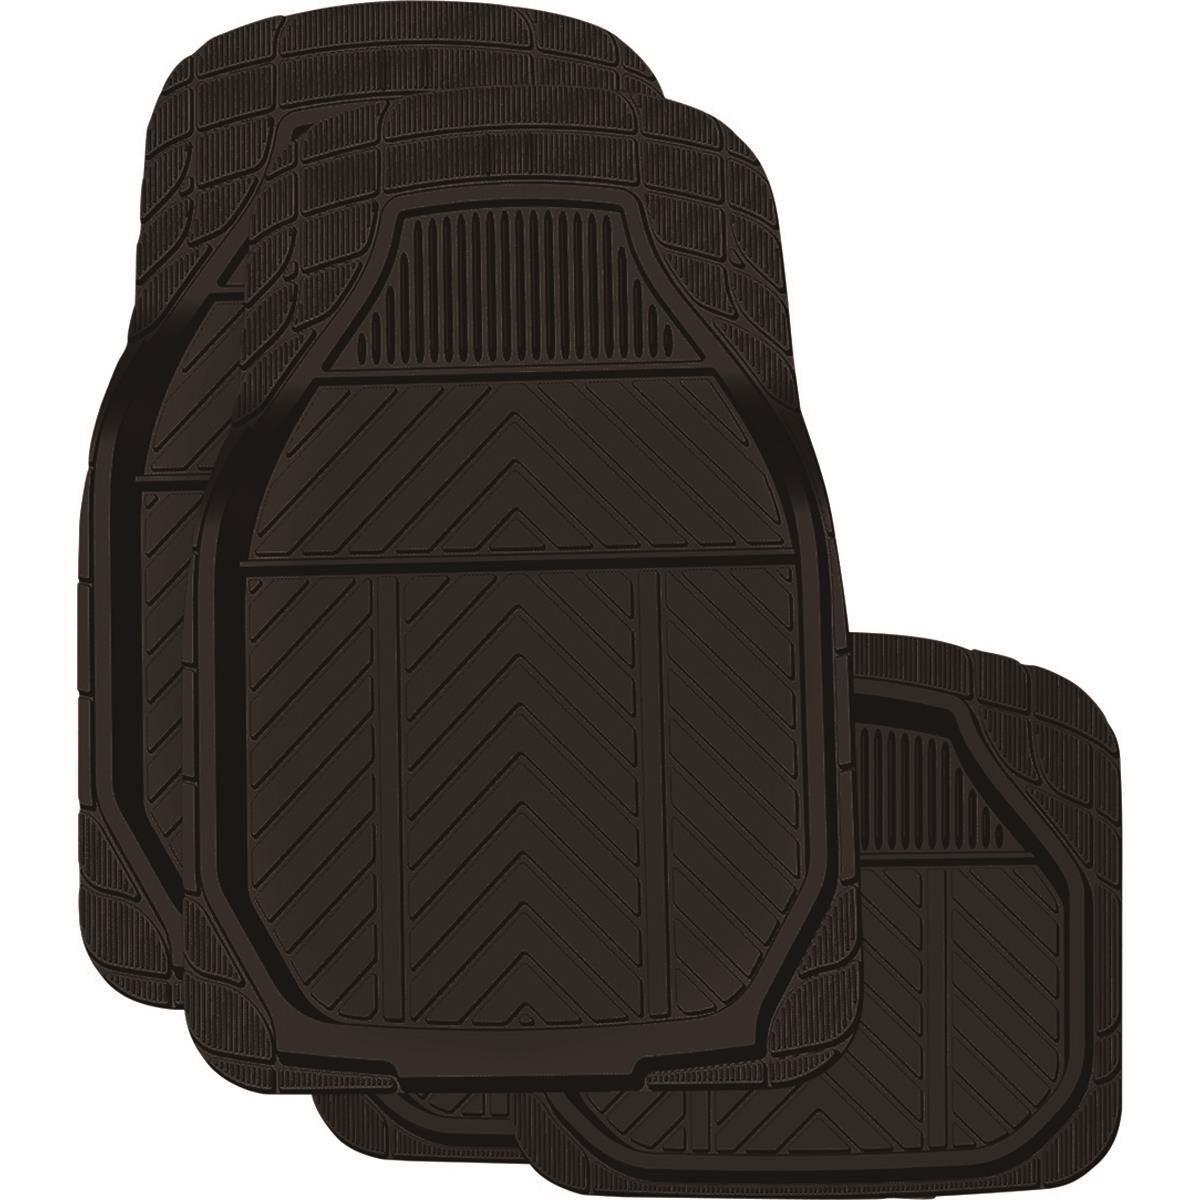 ridge ryder deep dish car floor mats rubber black set of 4 supercheap auto [ 1000 x 1000 Pixel ]